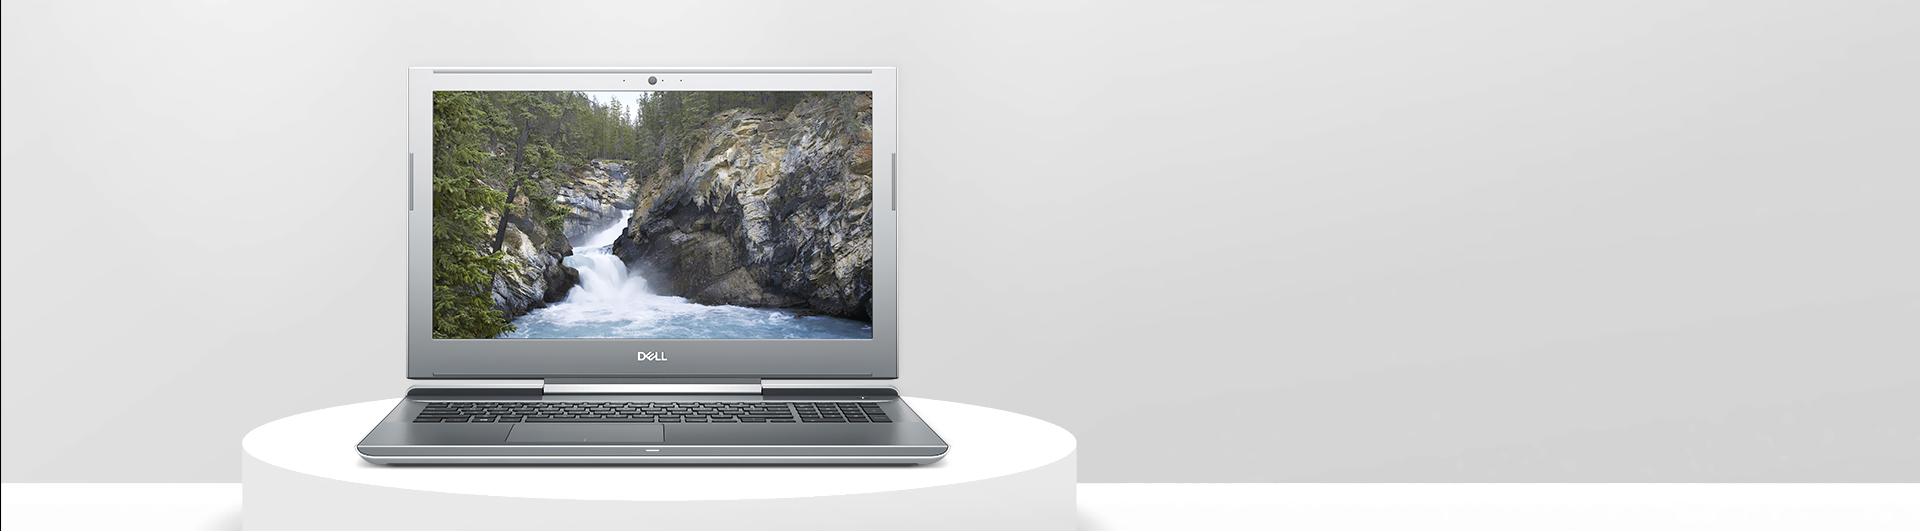 Laptop Dell Vostro 7570 - 70138566 mặt trước